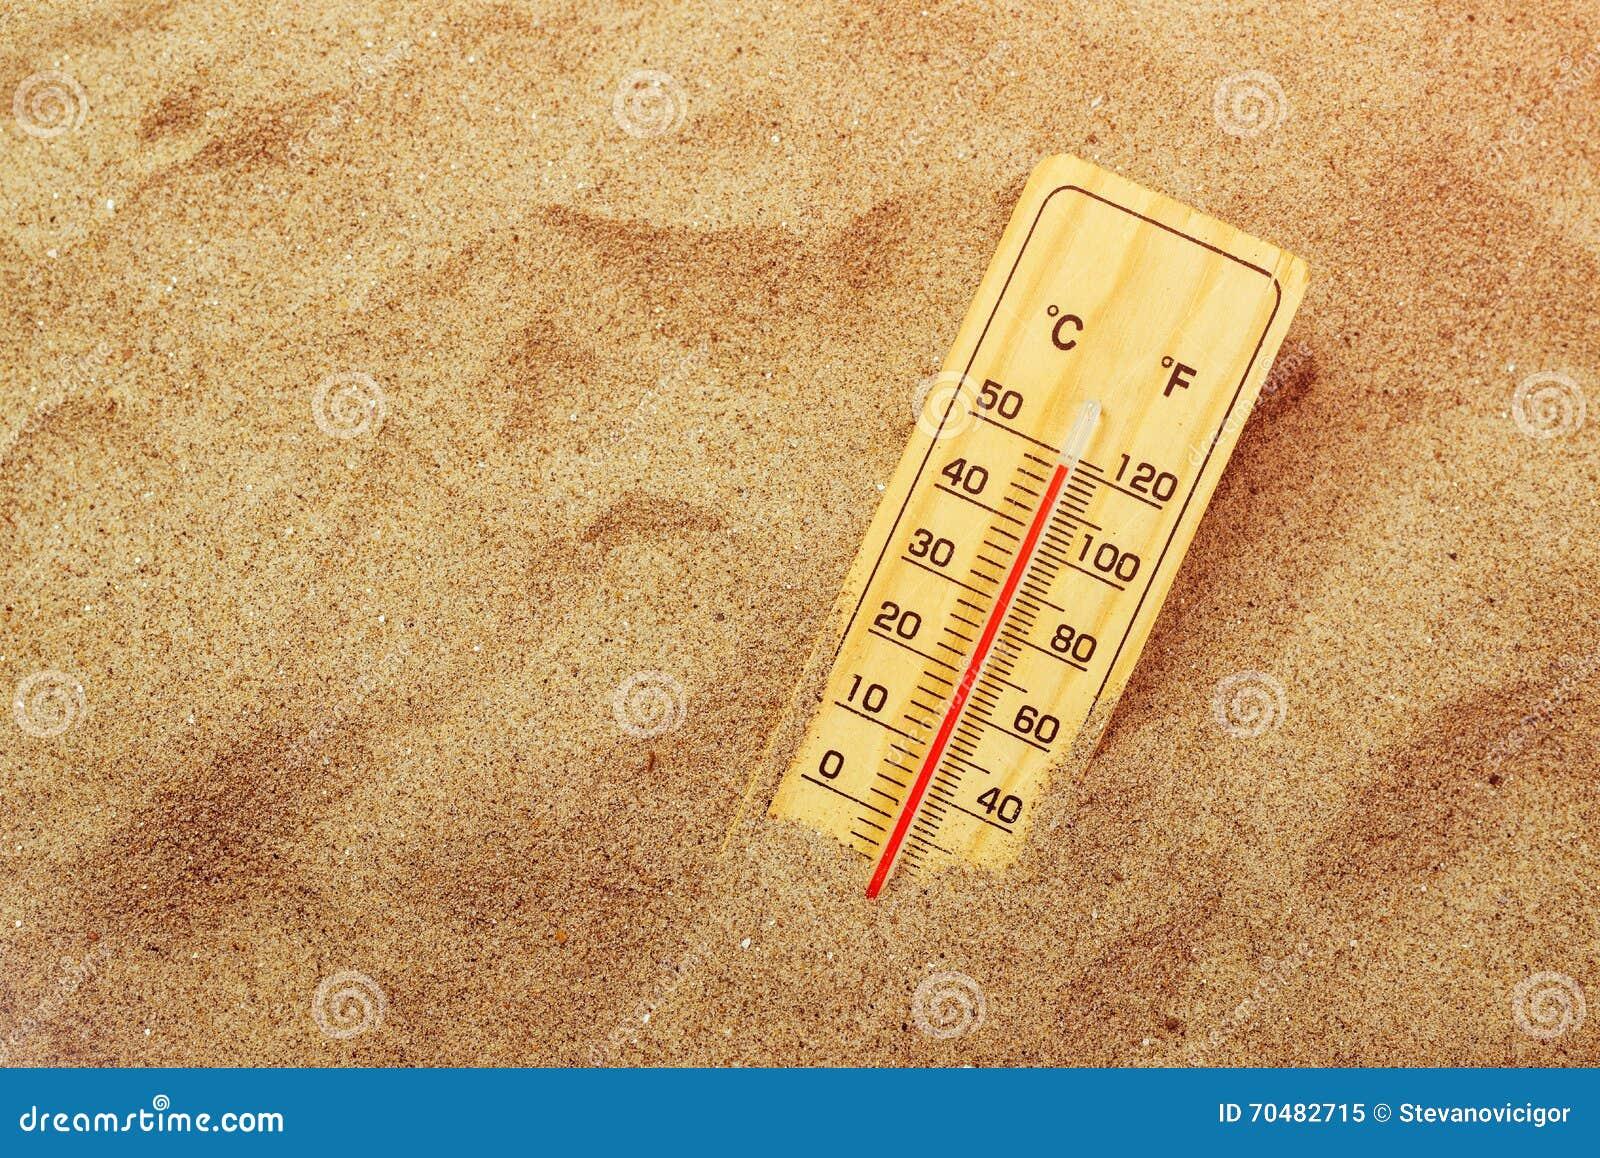 Thermometer on warm desert sand